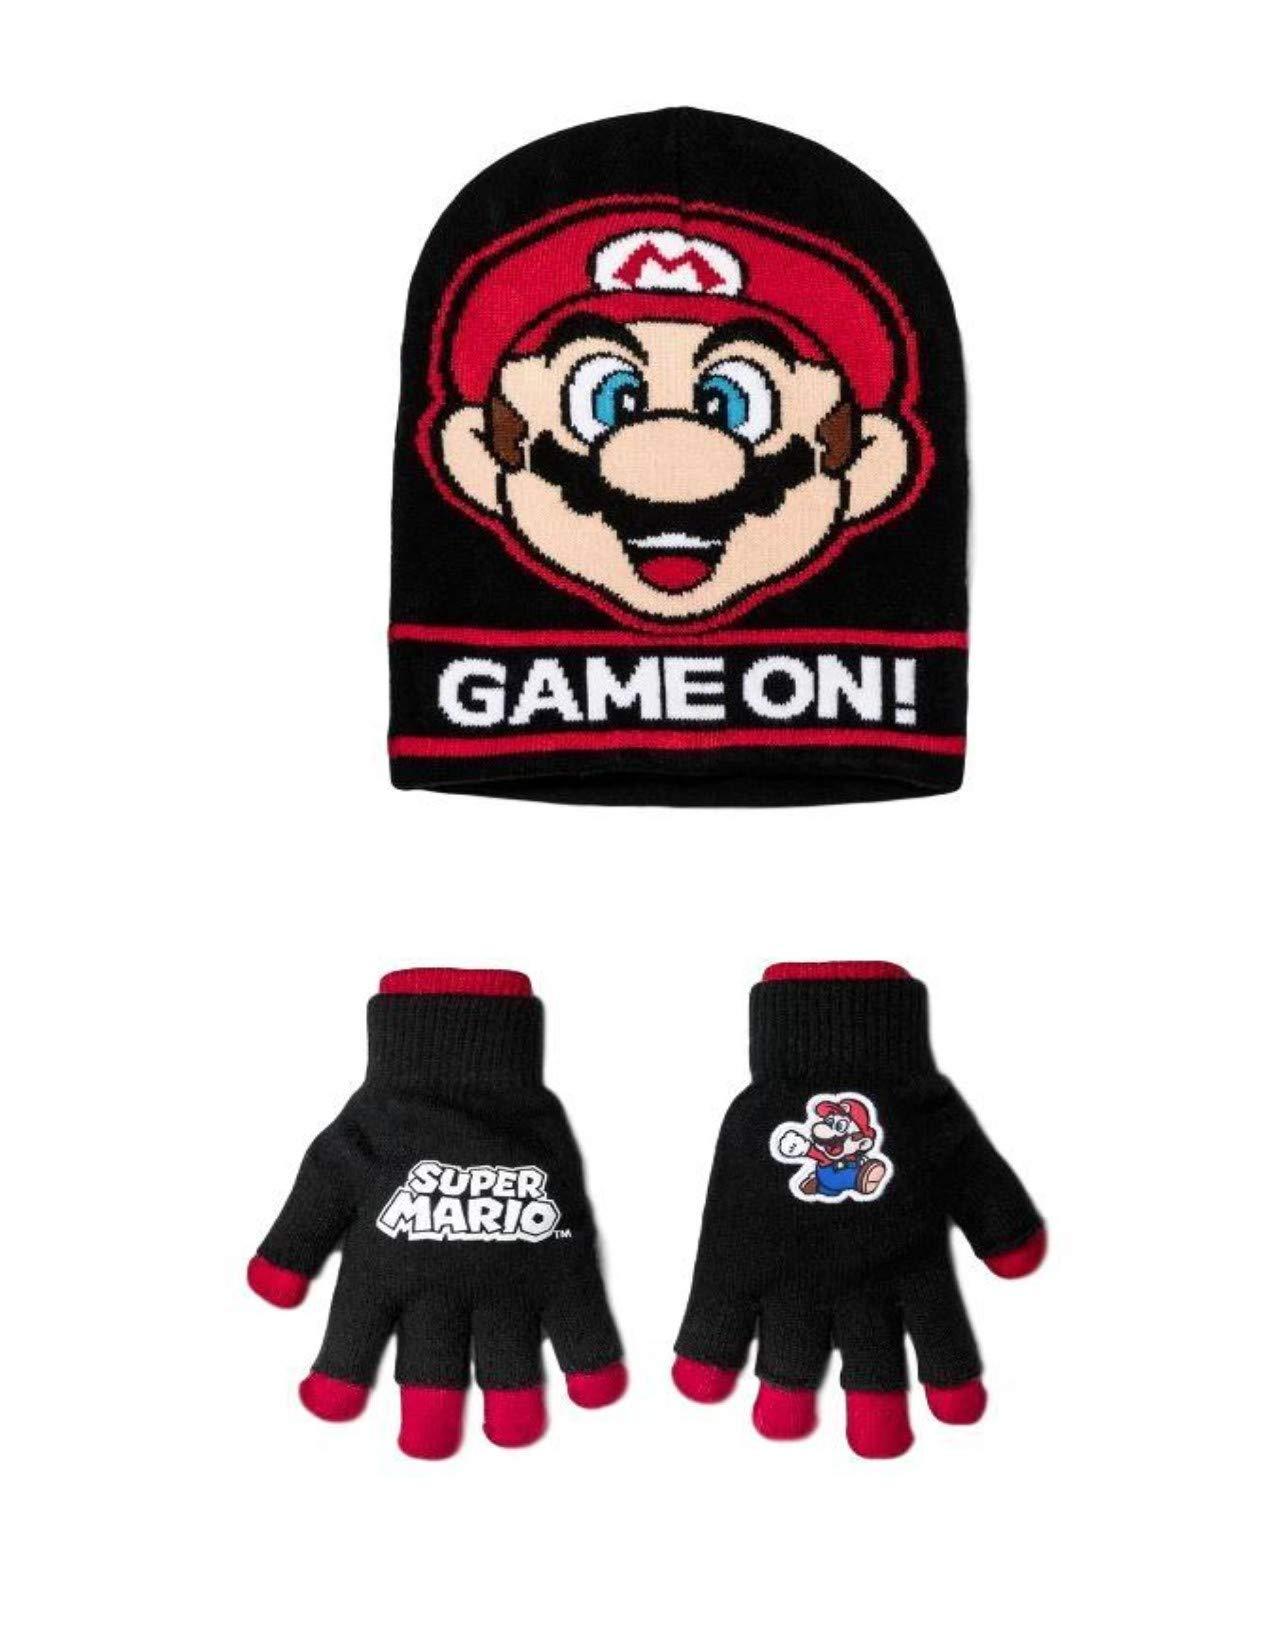 Mario Super Boy Winter Beanie Hat and Glove Set 2 pc Cold Weather Set